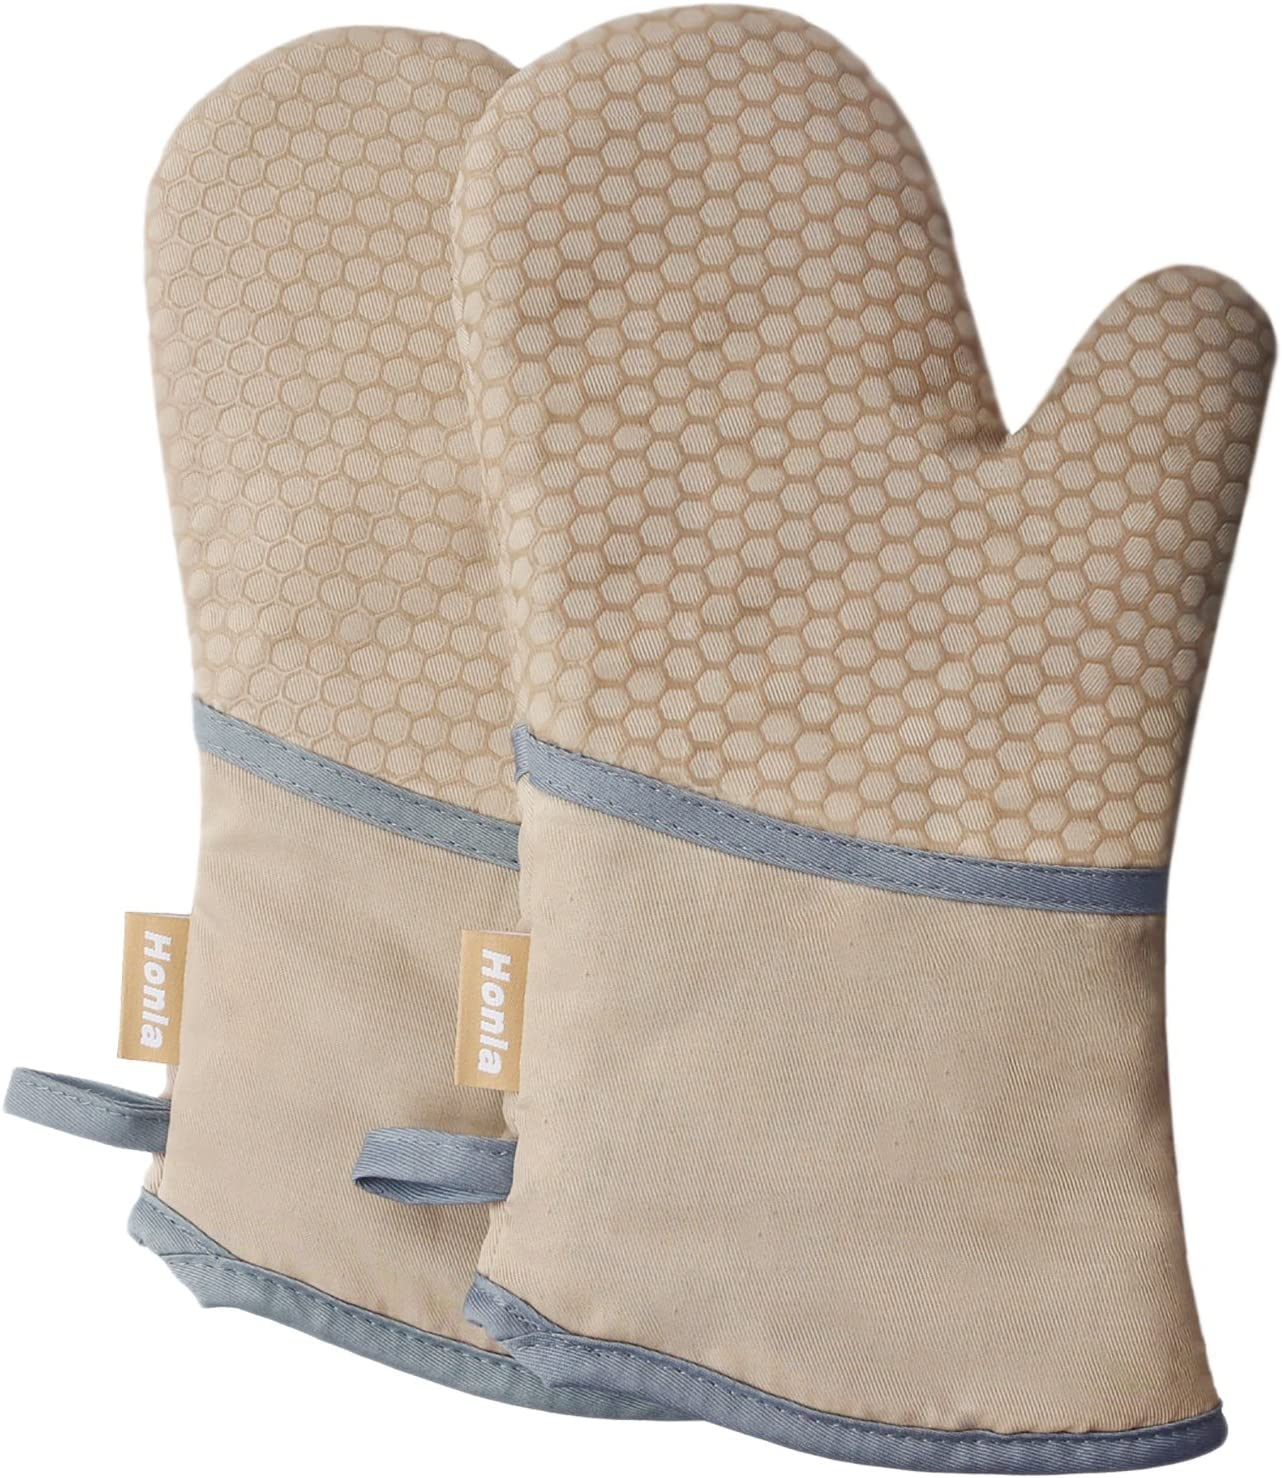 Single Oven Gloves// Gauntlet  Cooking Pot Holder Heat Resistant Mitt Mittens